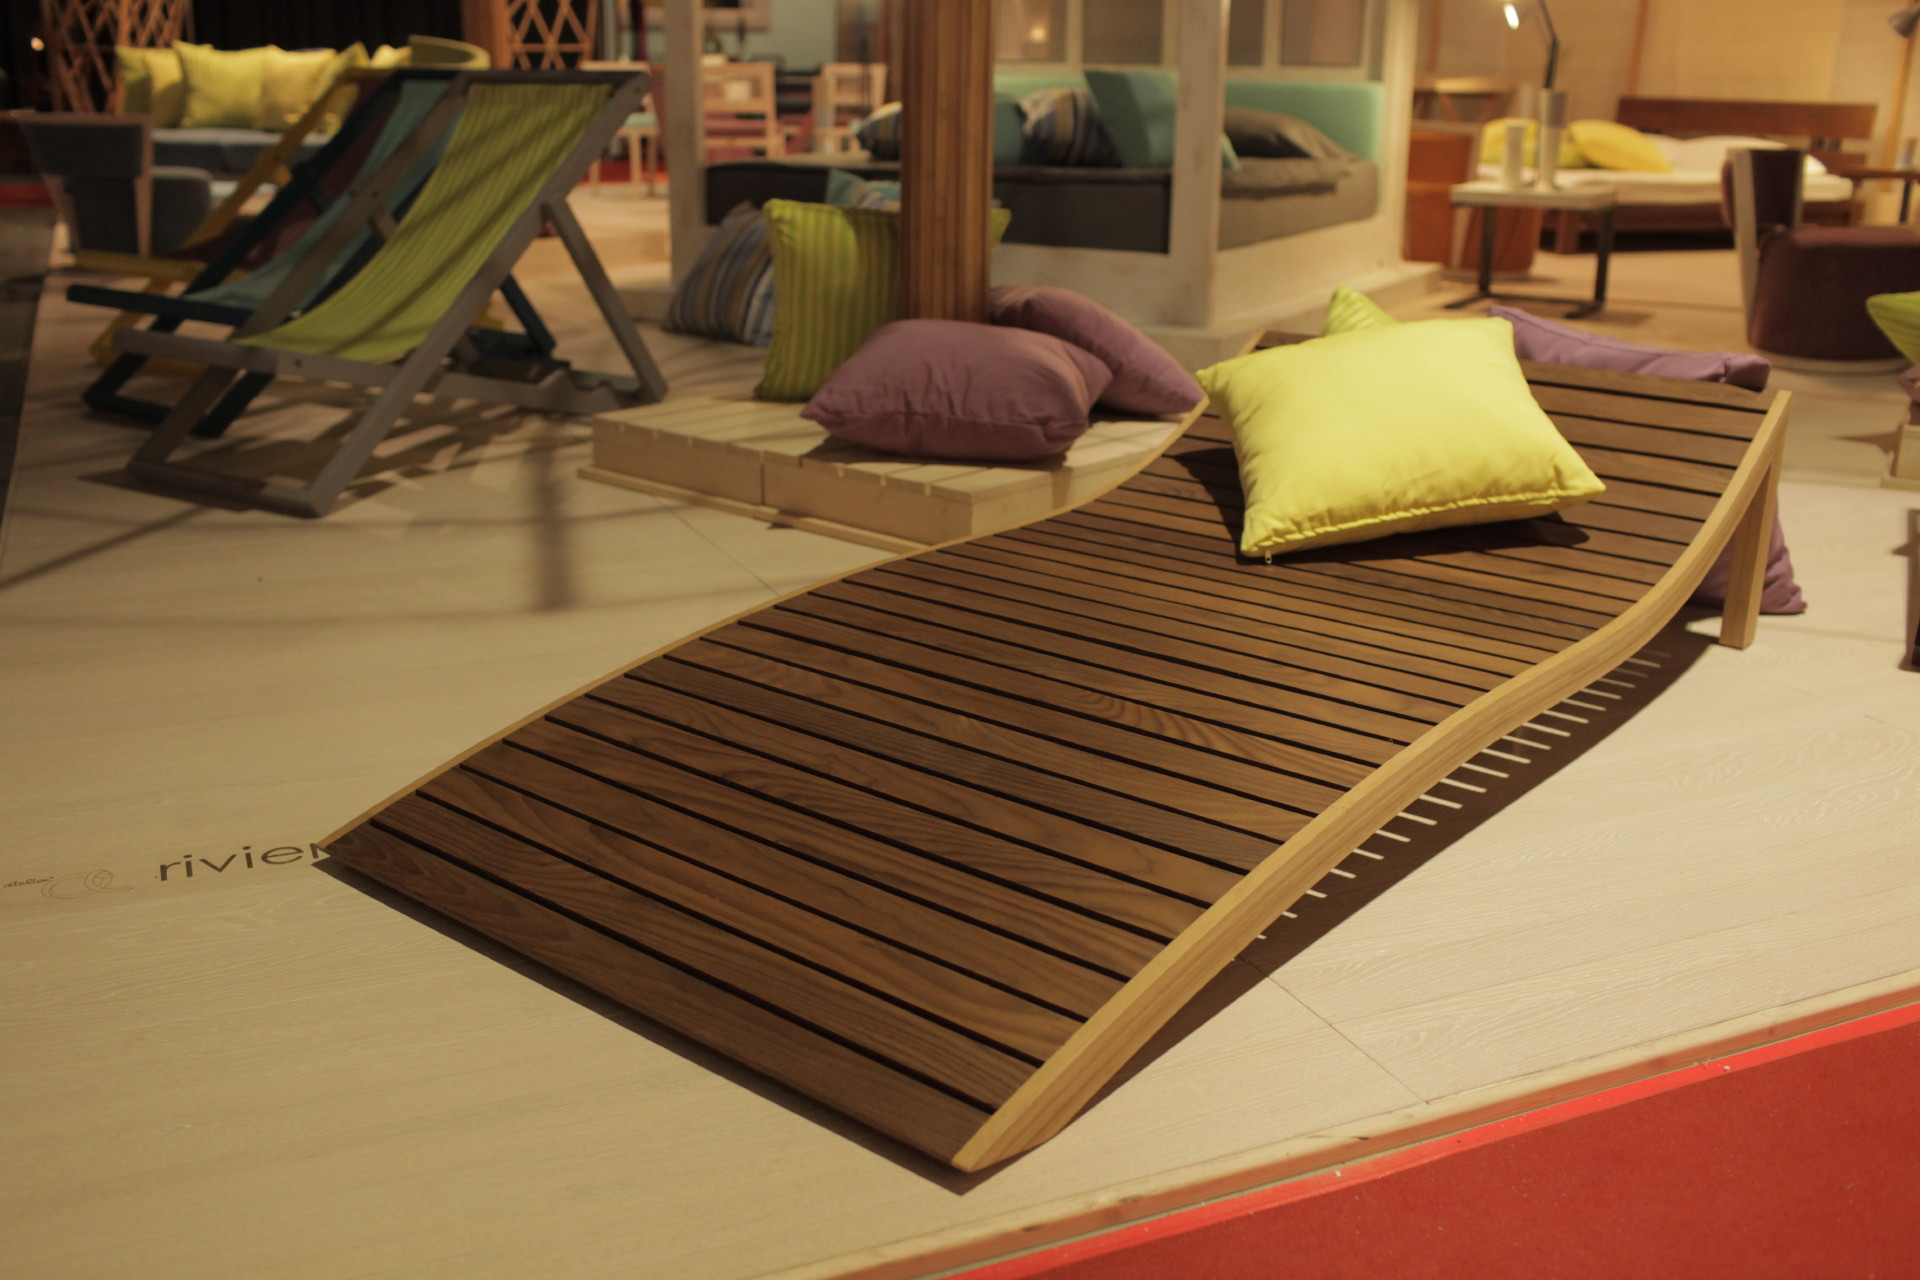 Attrayant Philippines International Furniture Show Celebrates Filipino Creativity,  Ingenuity And Craftsmanship